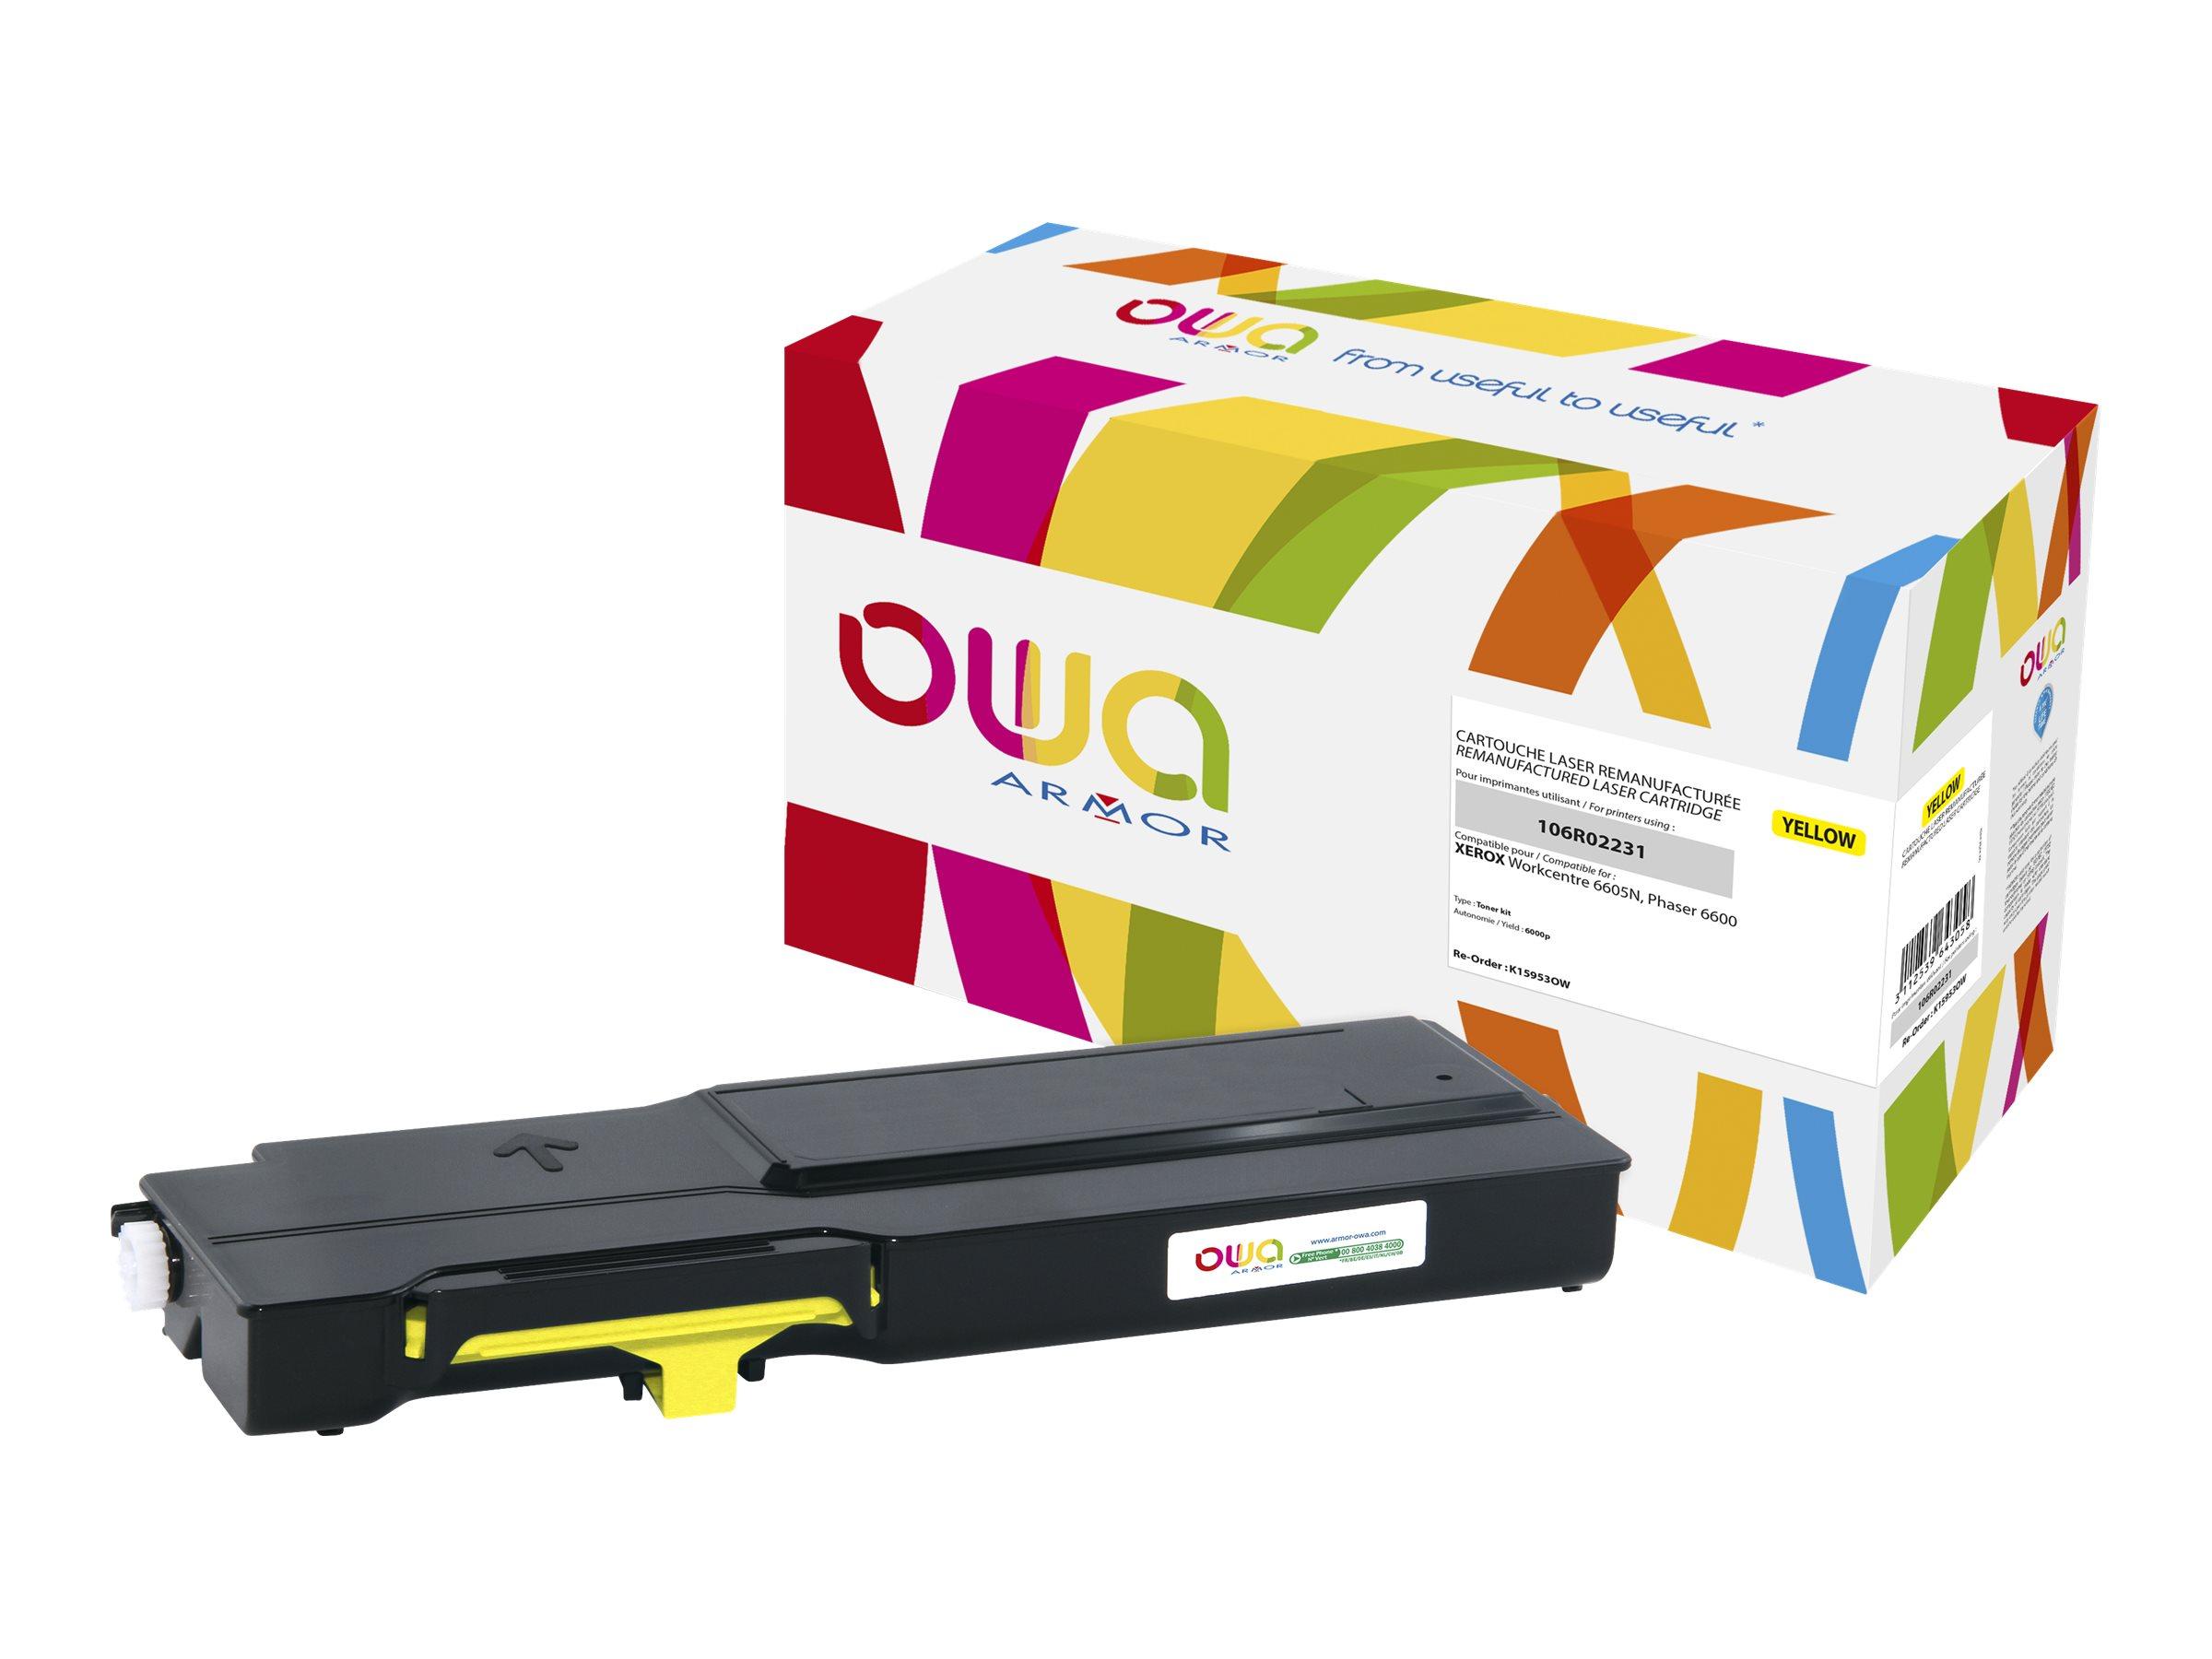 Xerox 106R02231 - remanufacturé OWA K15953OW - jaune - cartouche laser